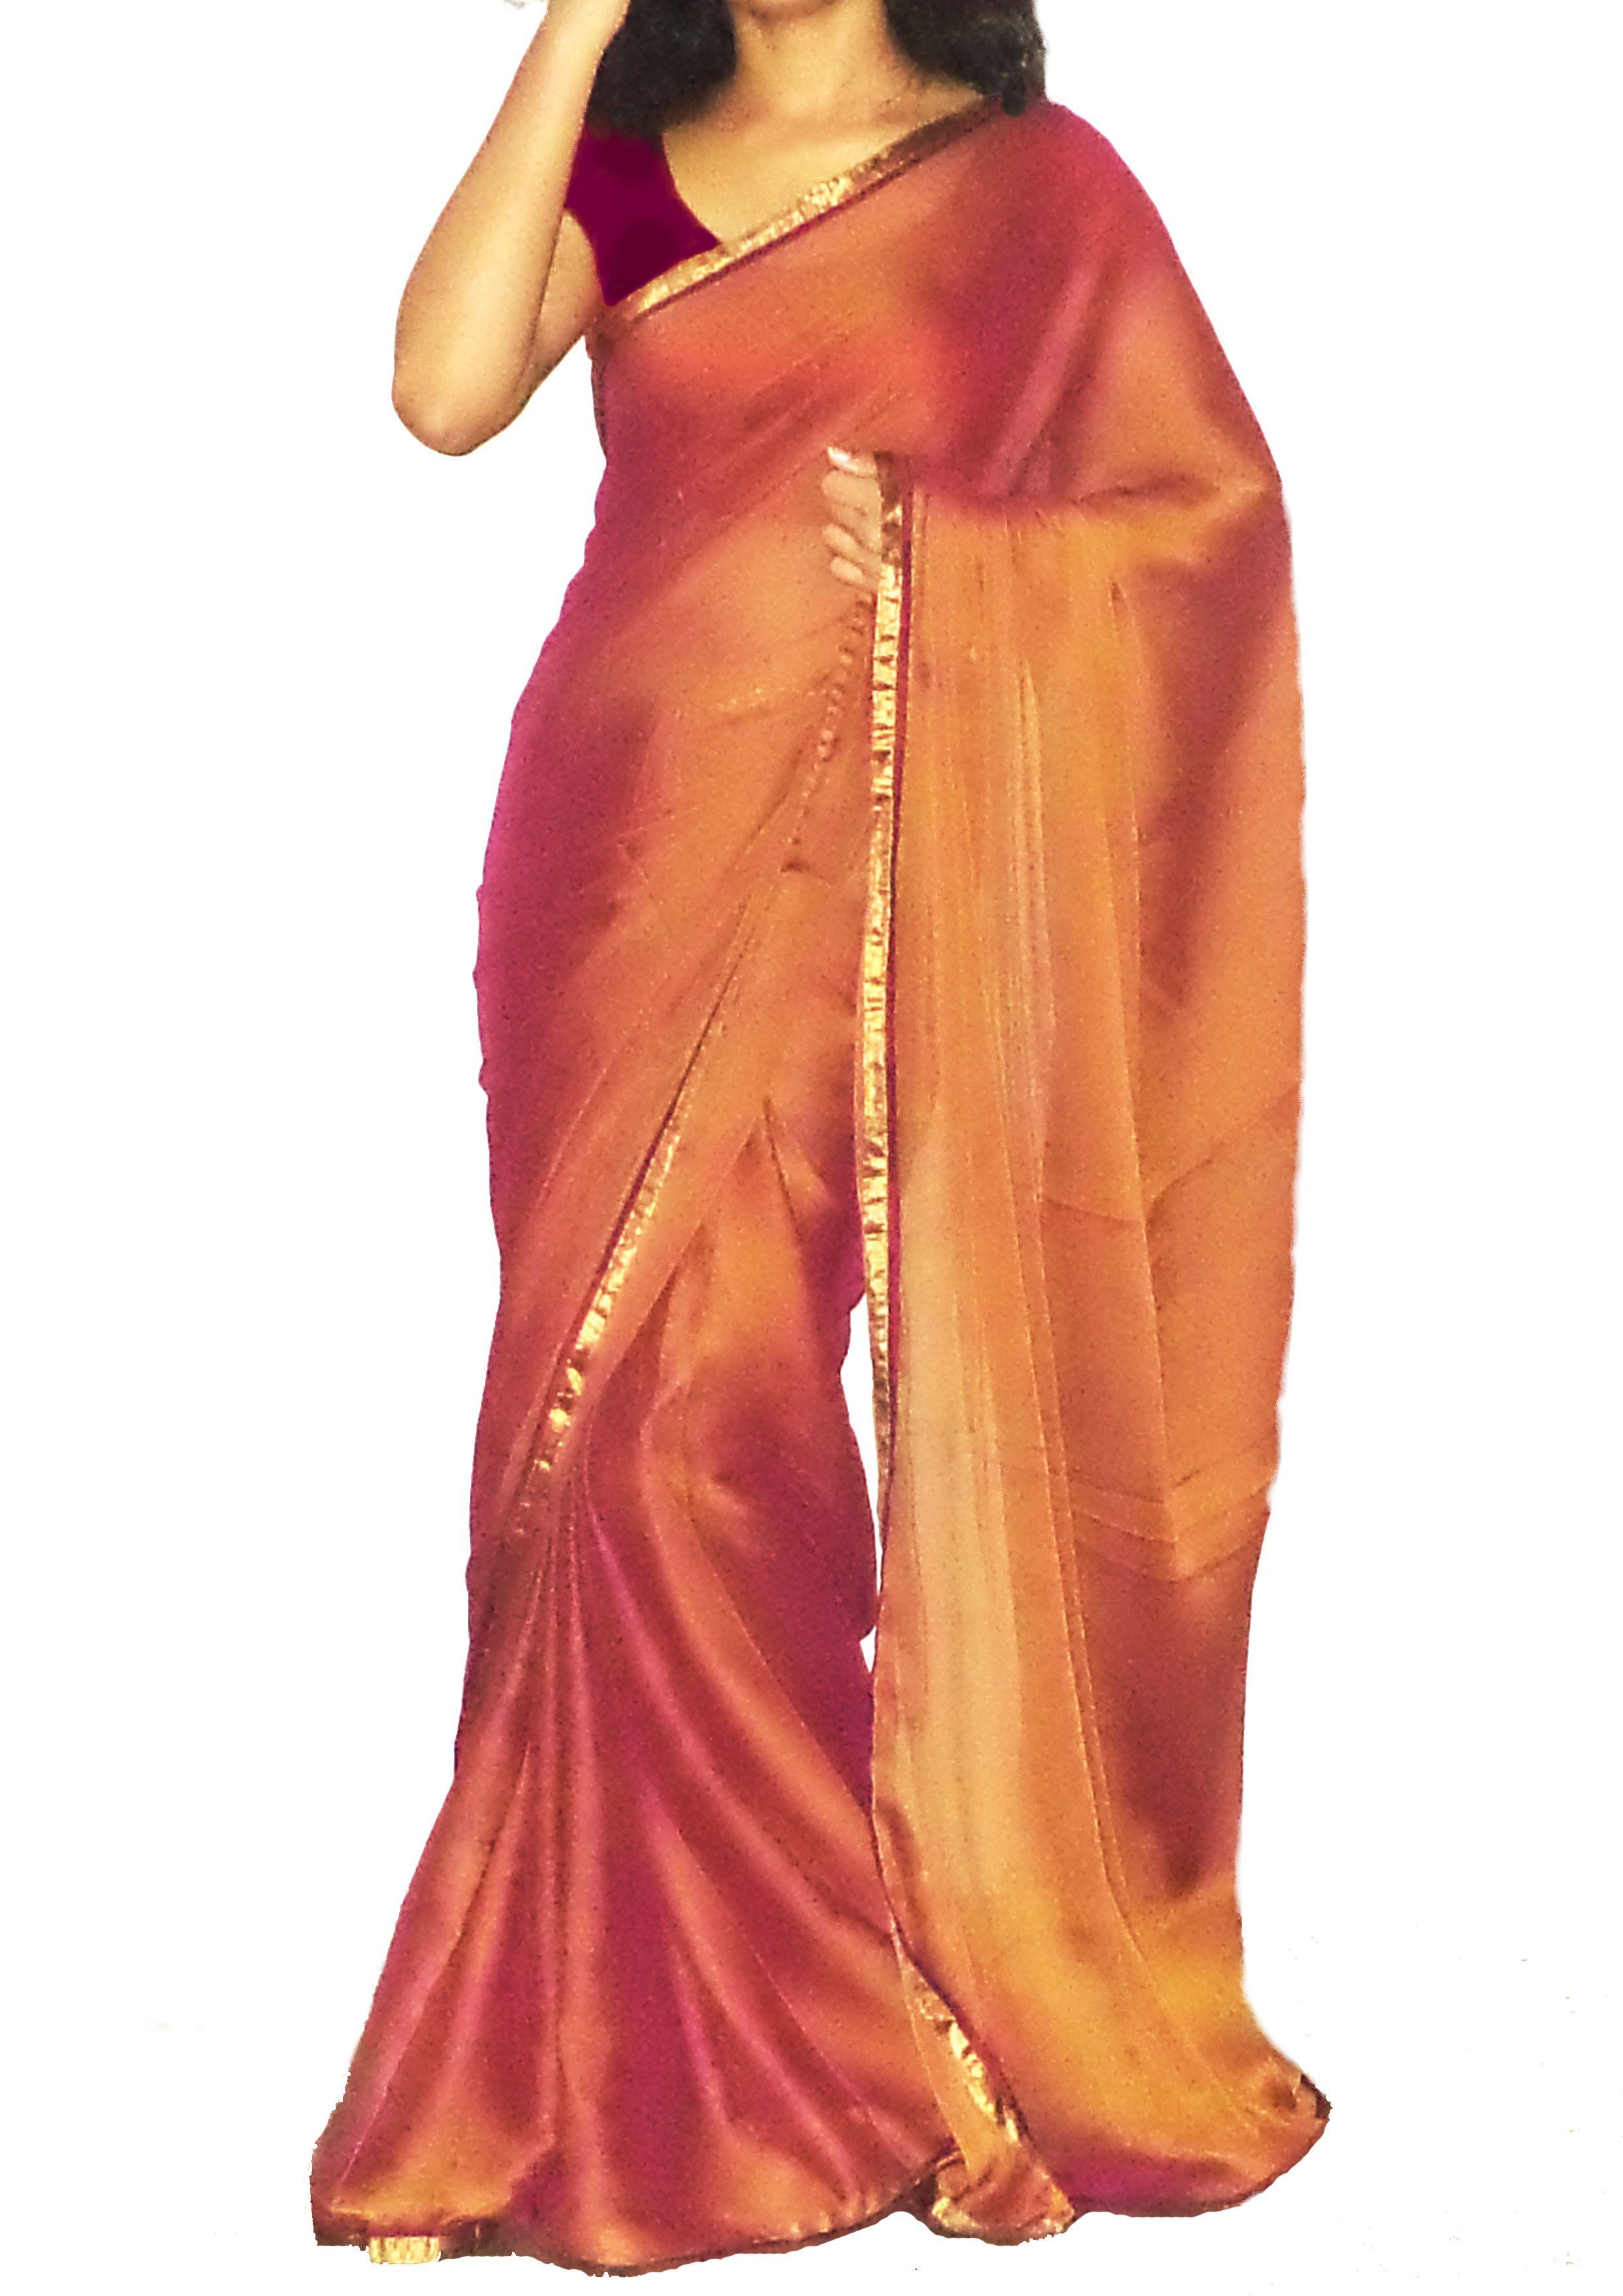 Chiffon Sari Party Wear Indian Wedding Plain Saree With Blouse Piece Color-White